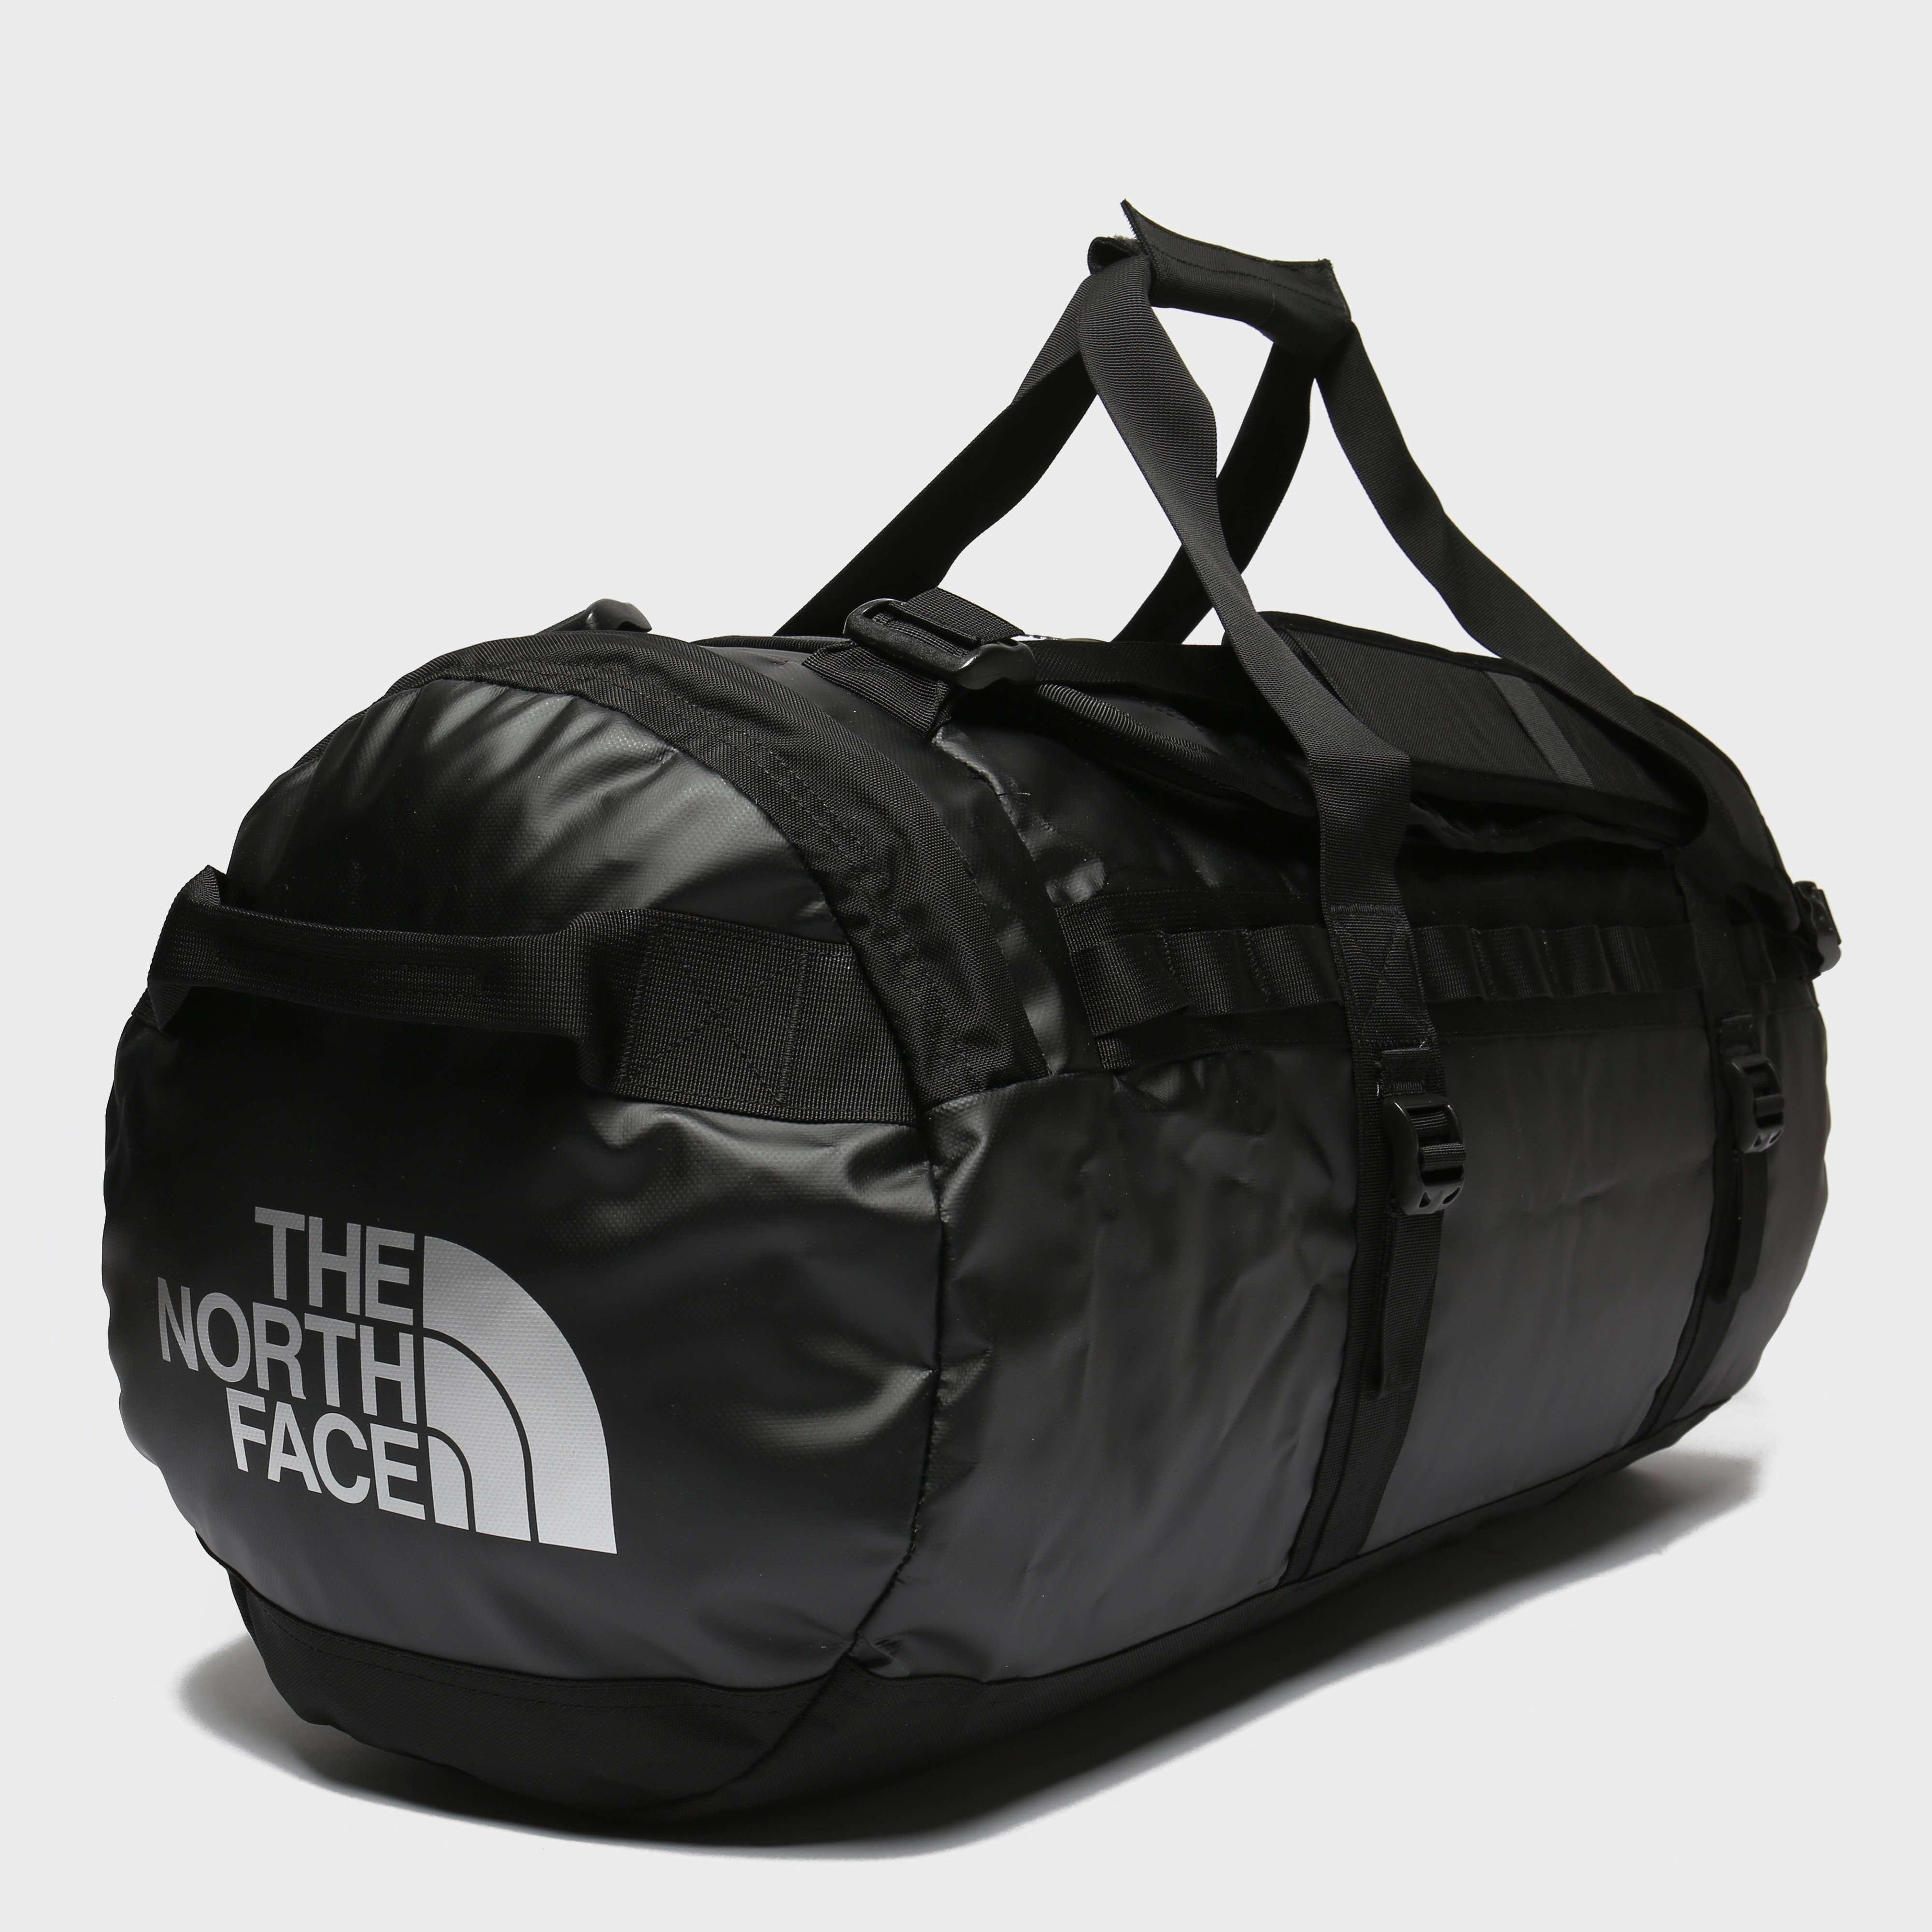 THE NORTH FACE Base Camp Duffel Bag (Medium)